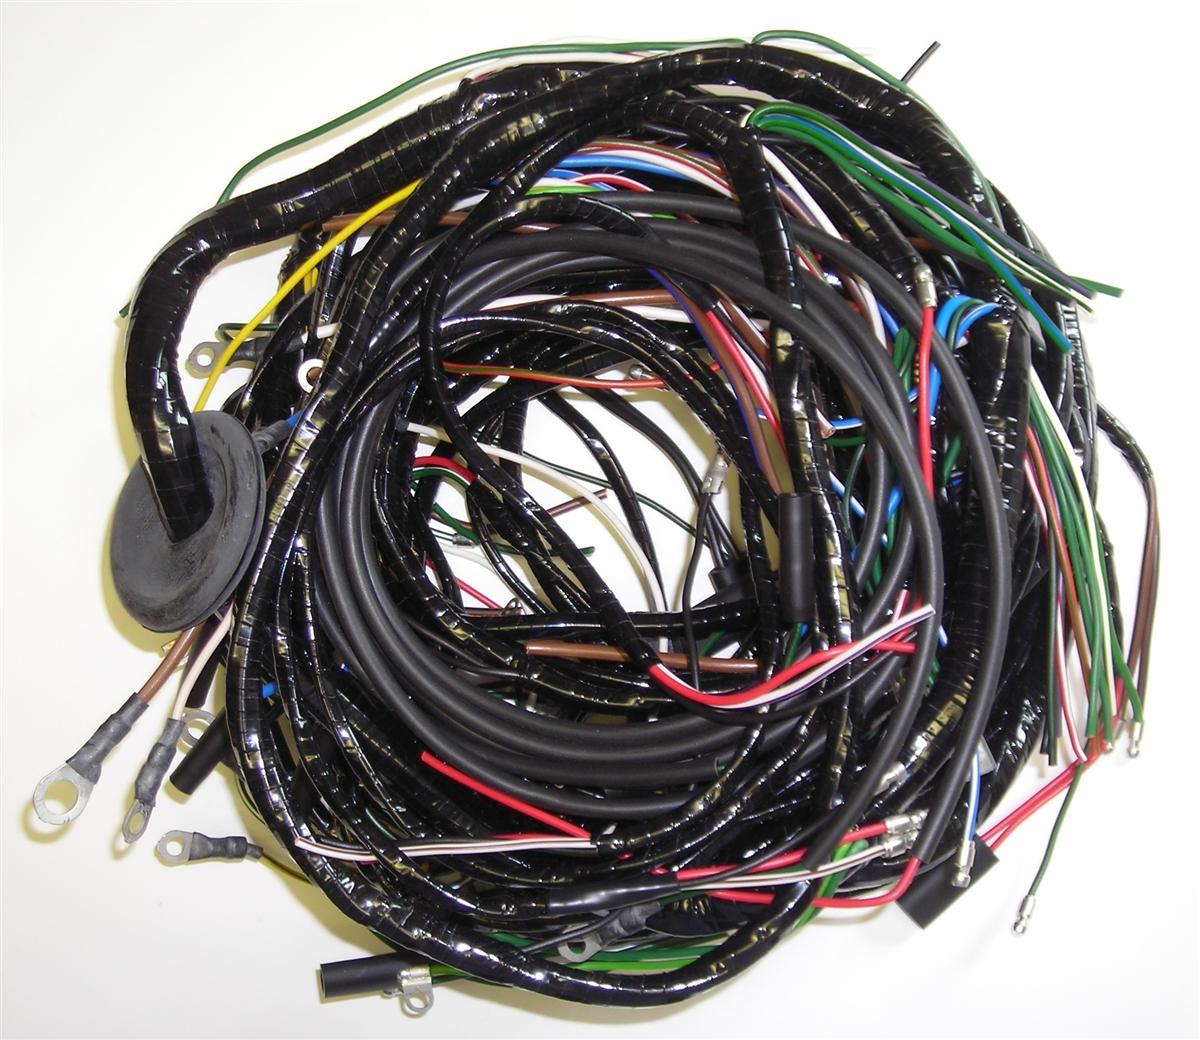 AC ACE Main Wiring HarnessBritish Wiring